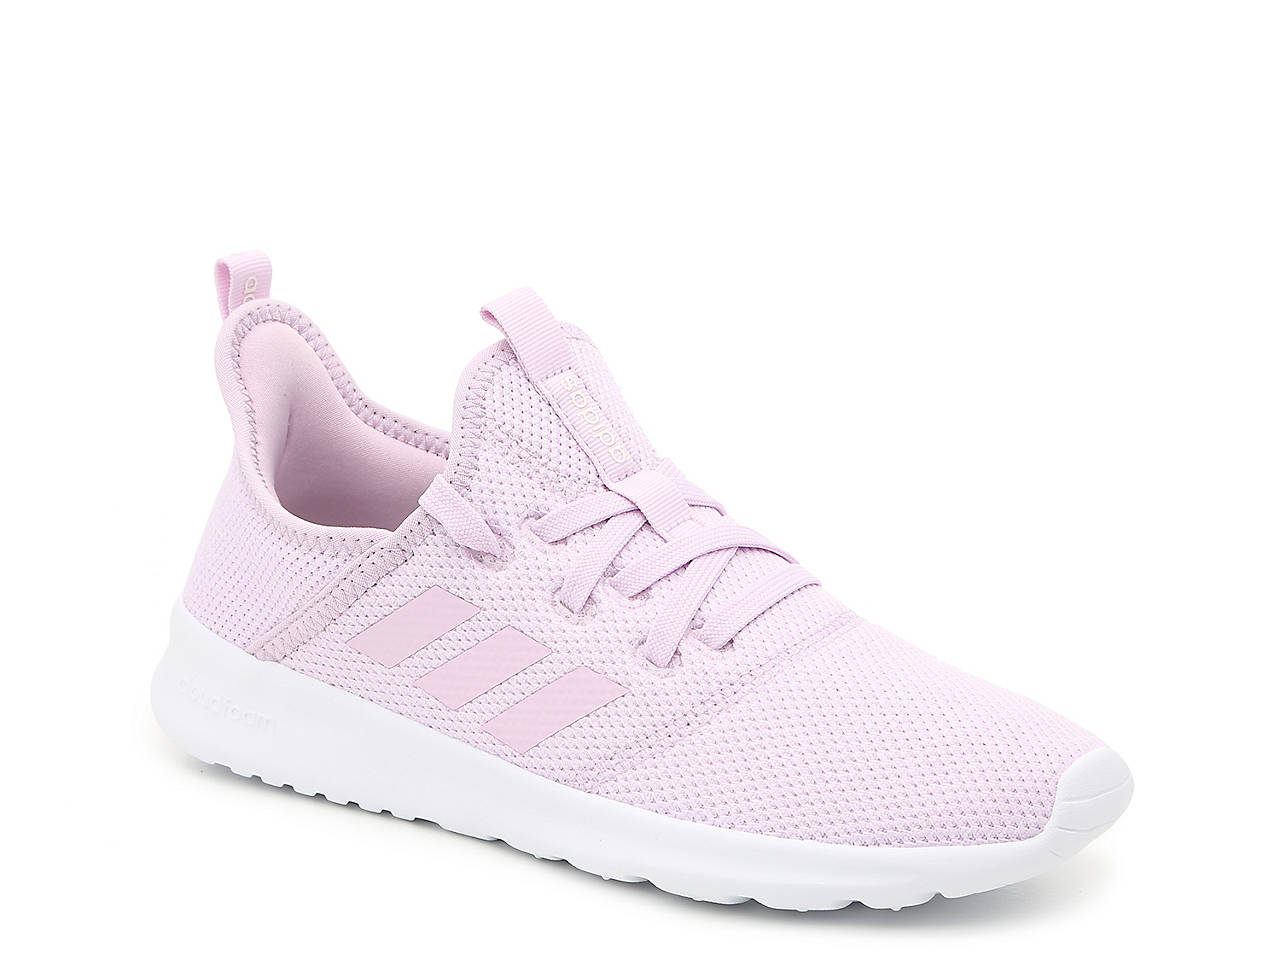 ccff7a00d9874a adidas Cloudfoam Pure Sneaker - Women s Women s Shoes